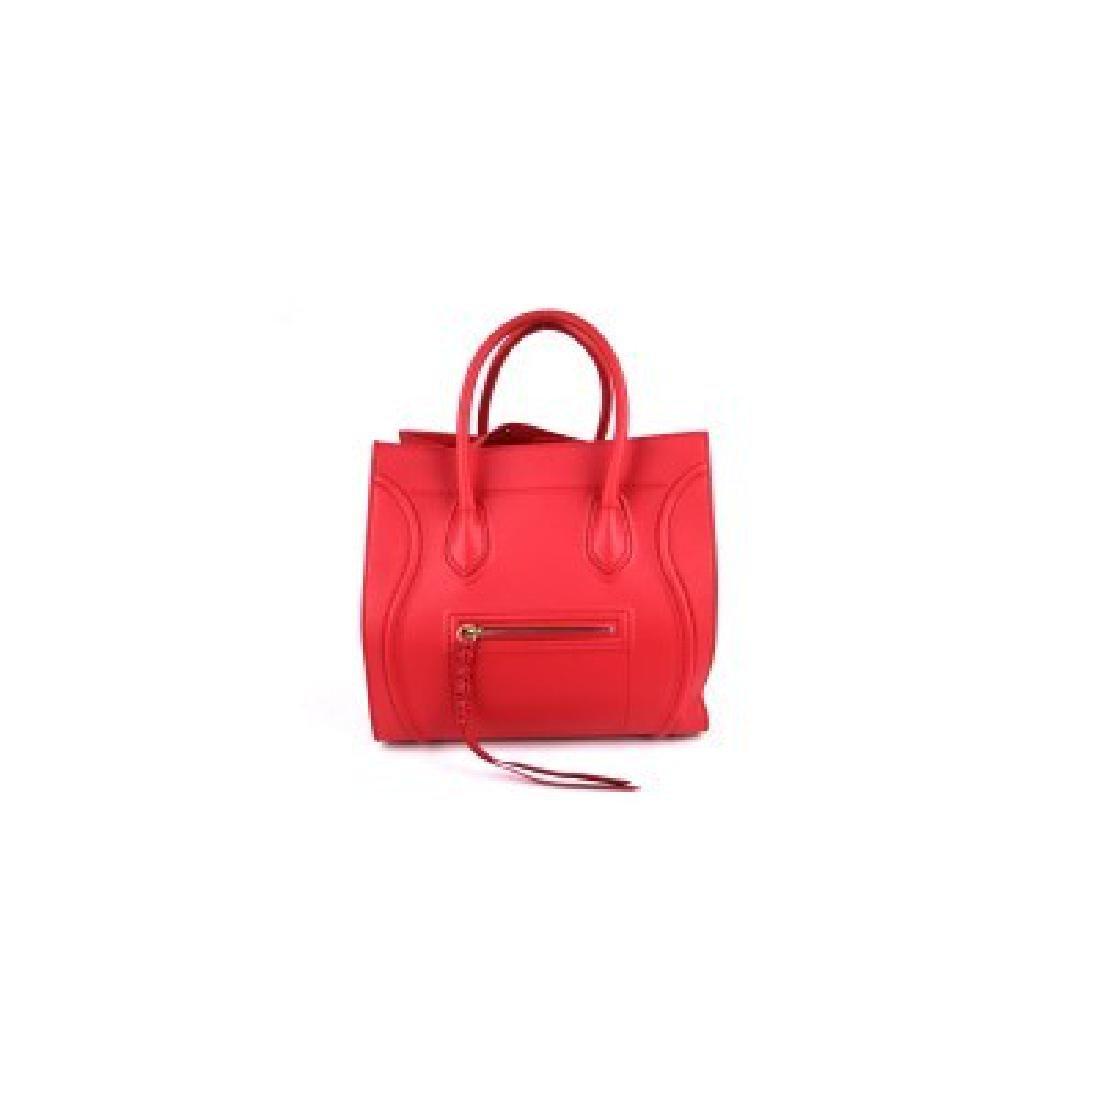 Celine Handbag Phantom Tote Handbag